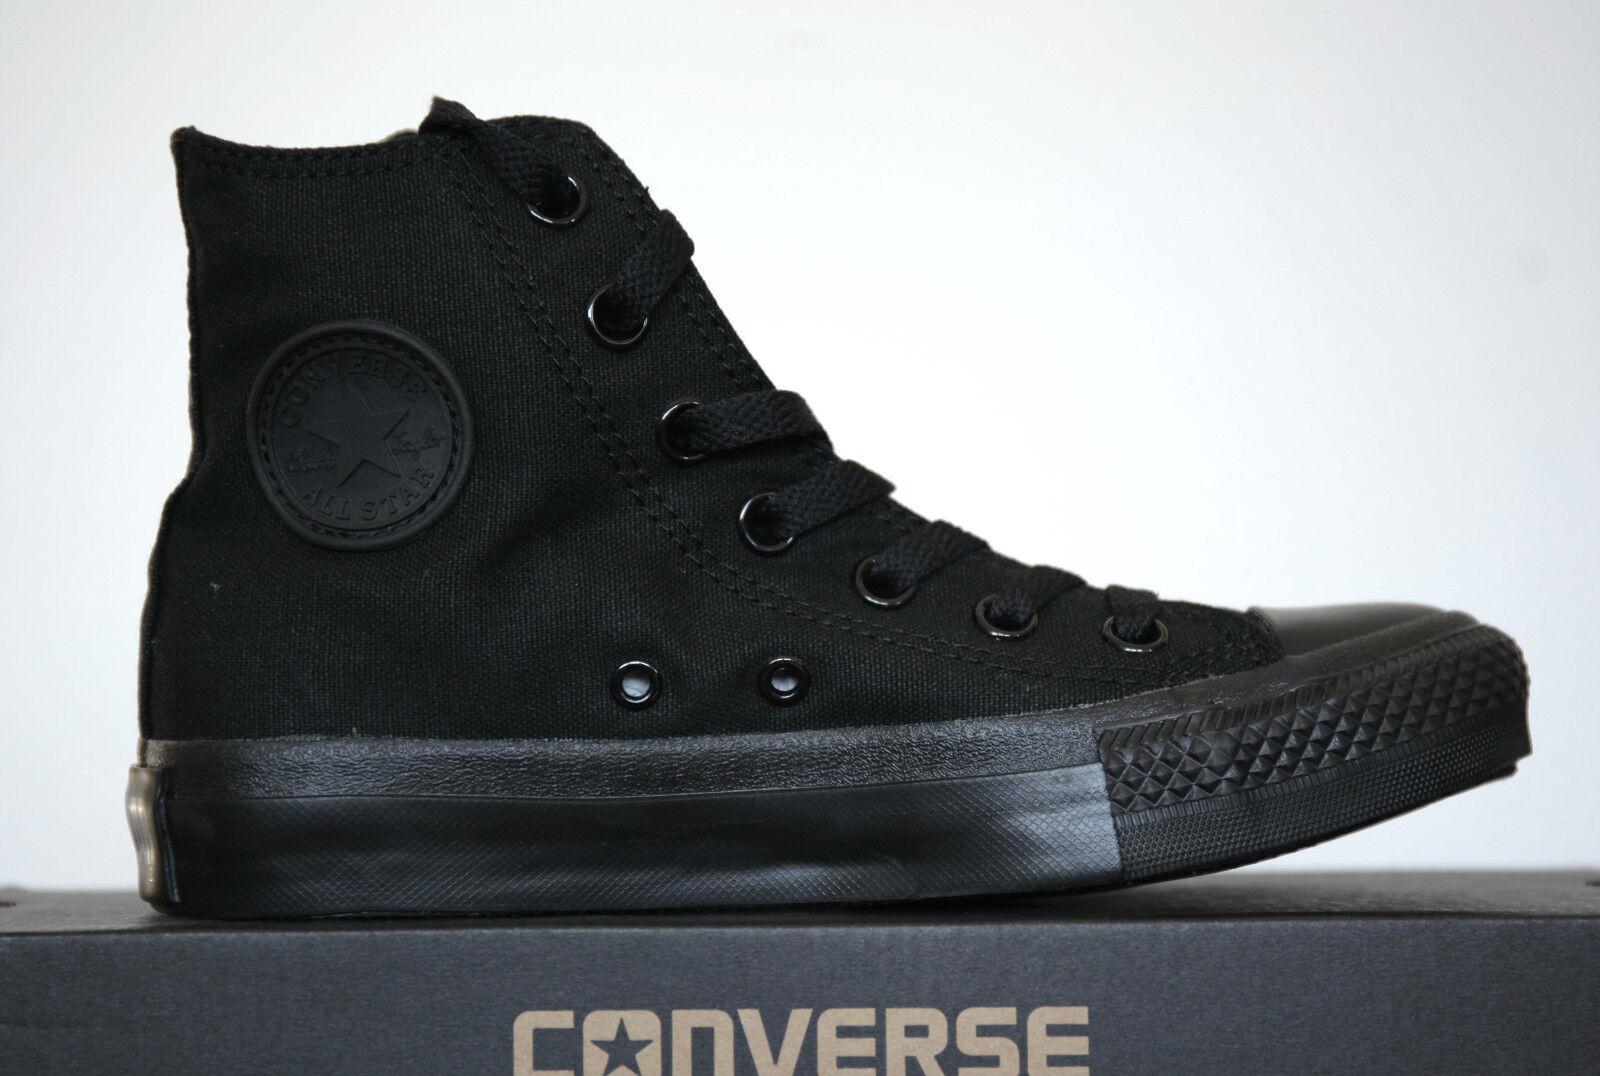 Neu All Star Converse Chucks HI Can Punk Mono Schwarz Schuhe M3310 Gr.36 UK 3,5